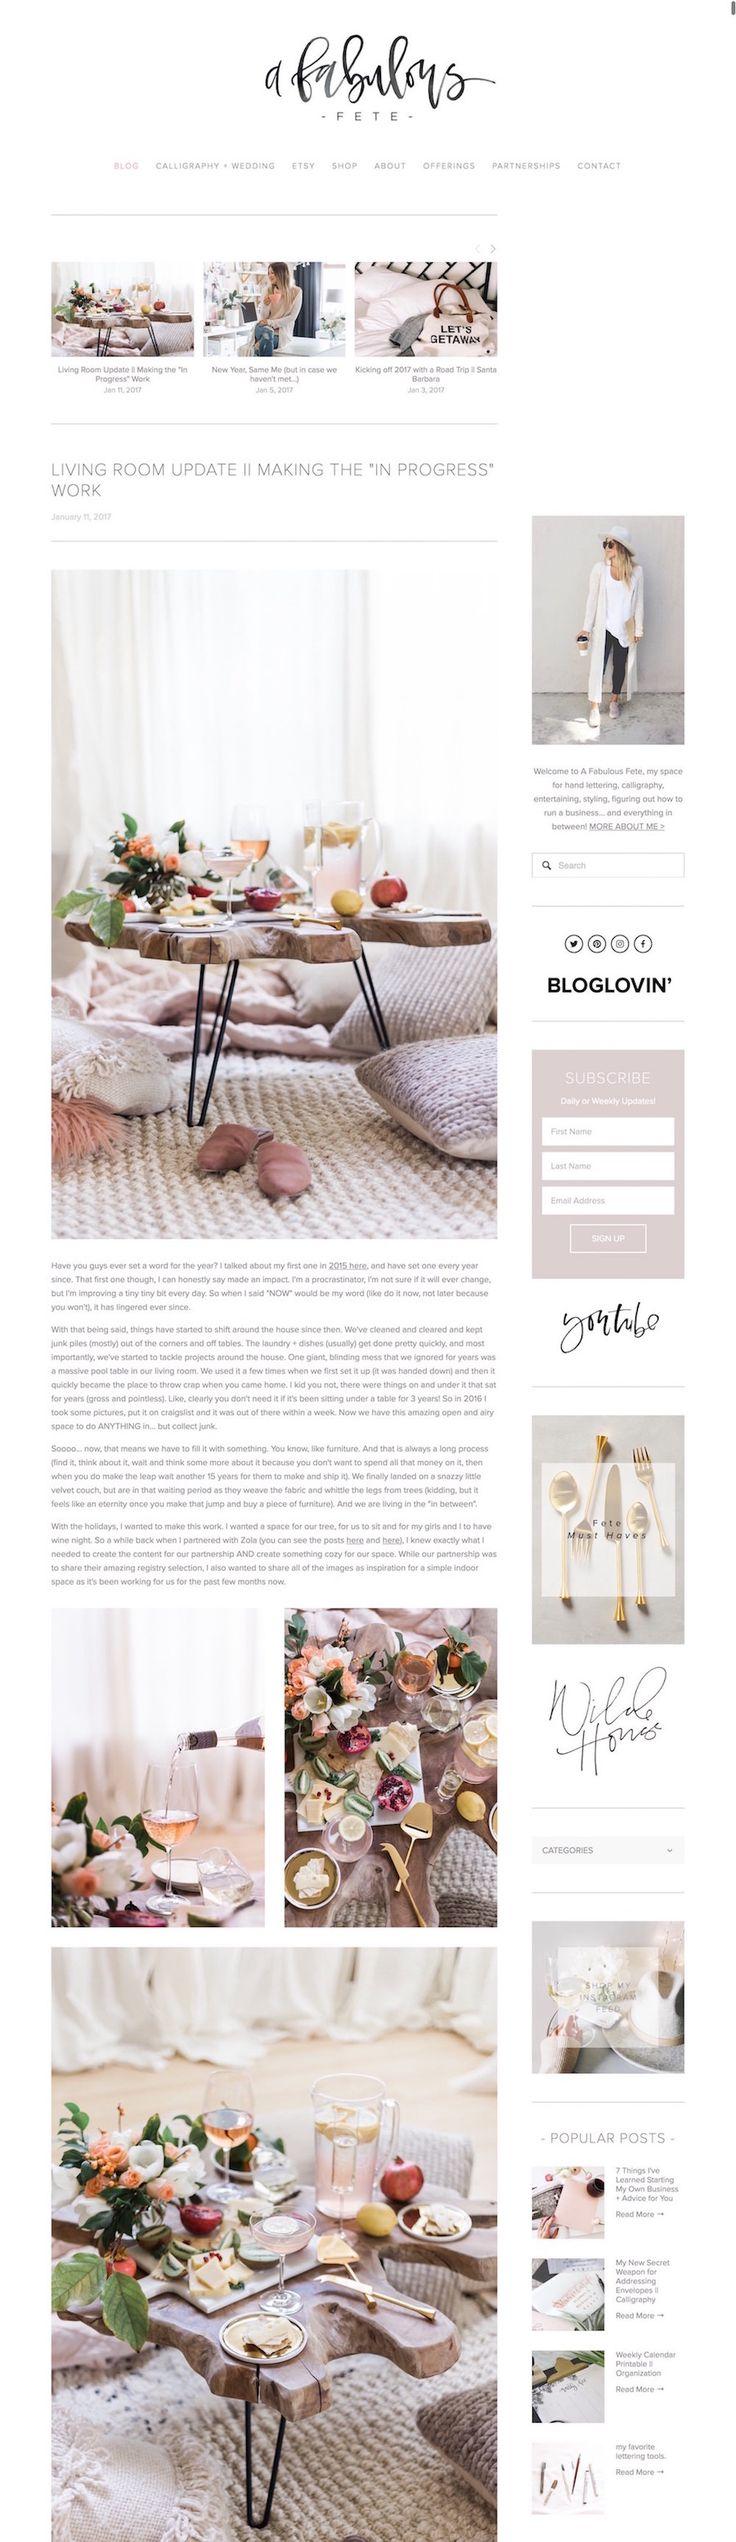 10 Squarespace example websites for inspiration • blogger edition — The Paige Studio • Squarespace Website Designer